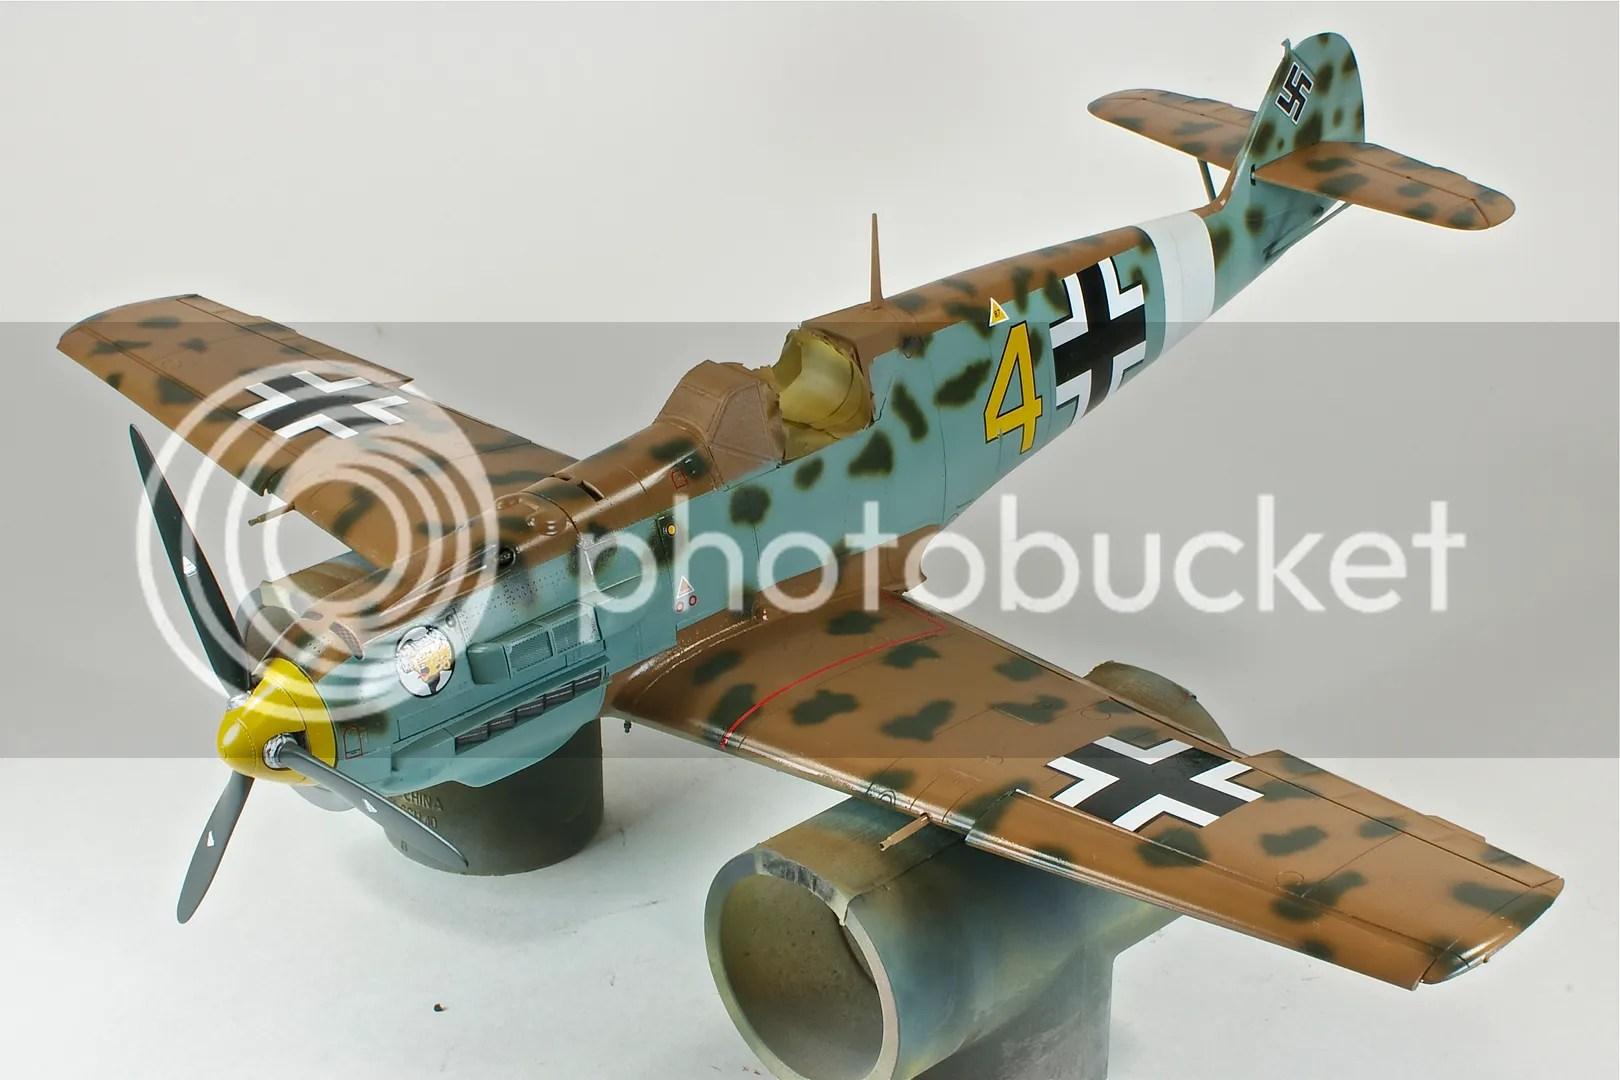 1/32,Bf 109E-7 Trop,Eduard,2011,Nikon D300s,February,scale models